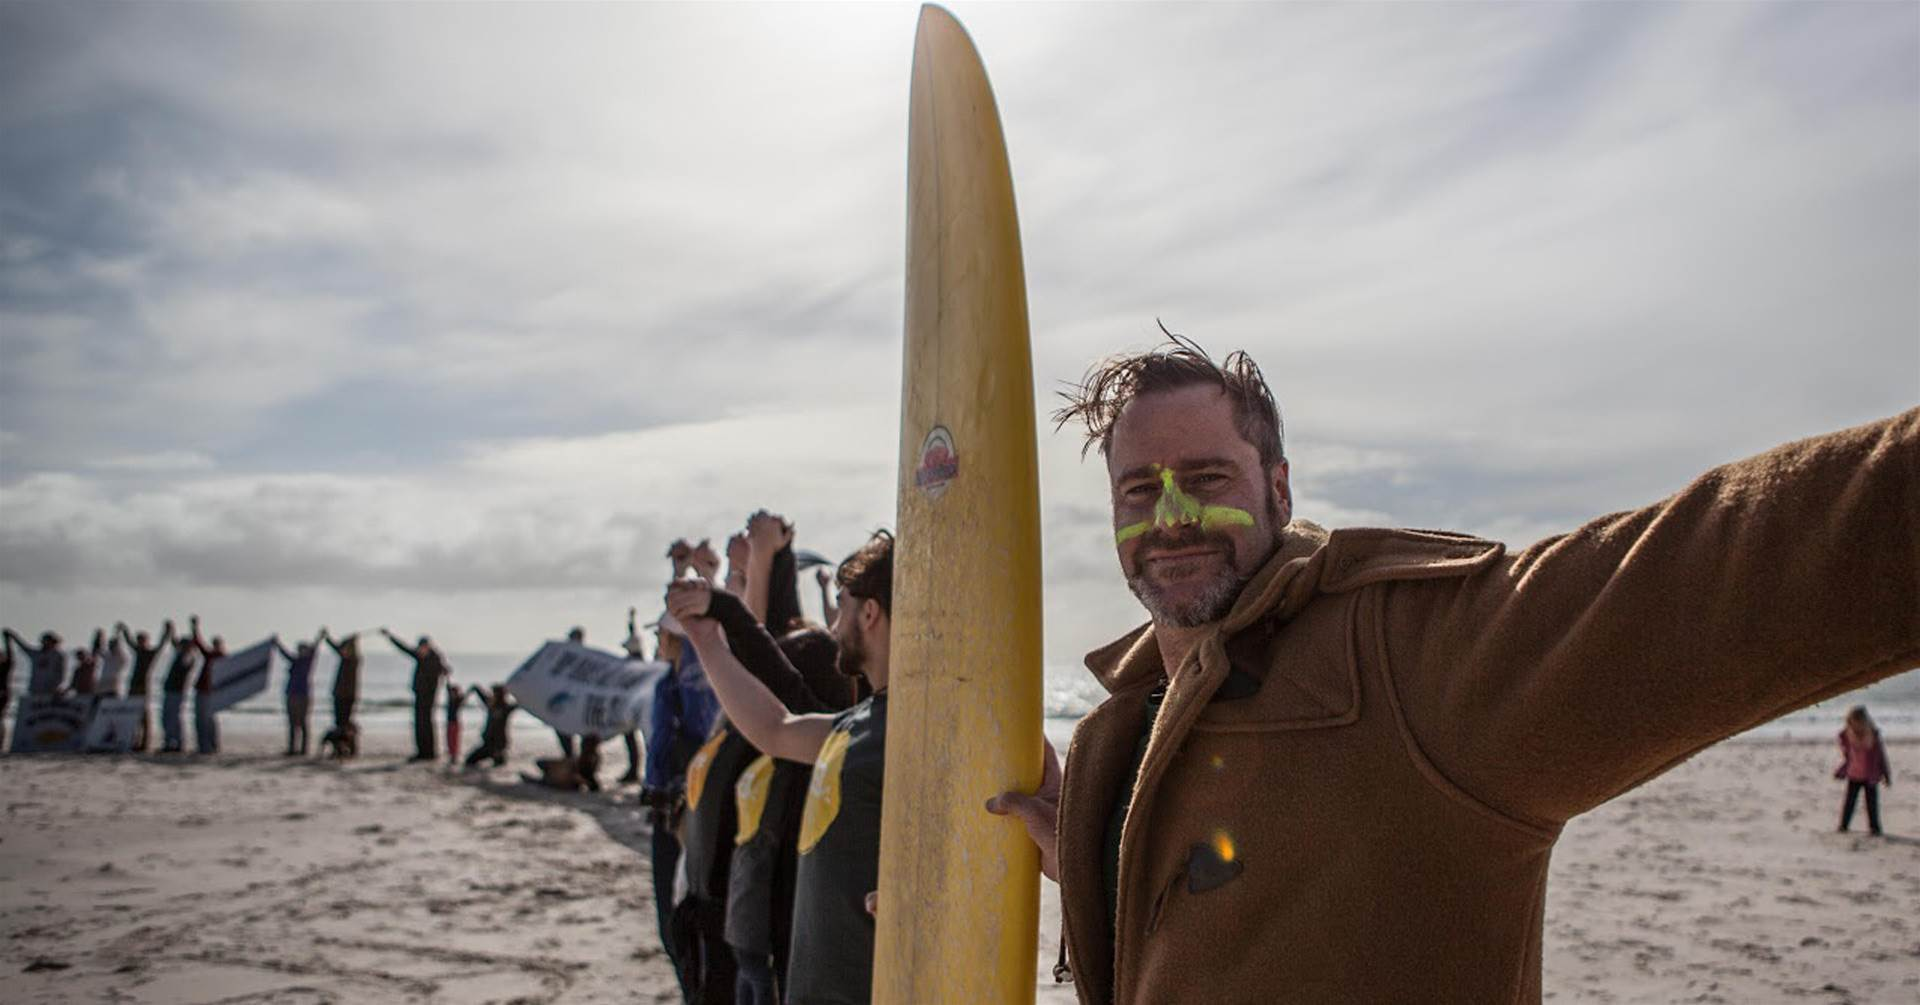 Senator Surfer